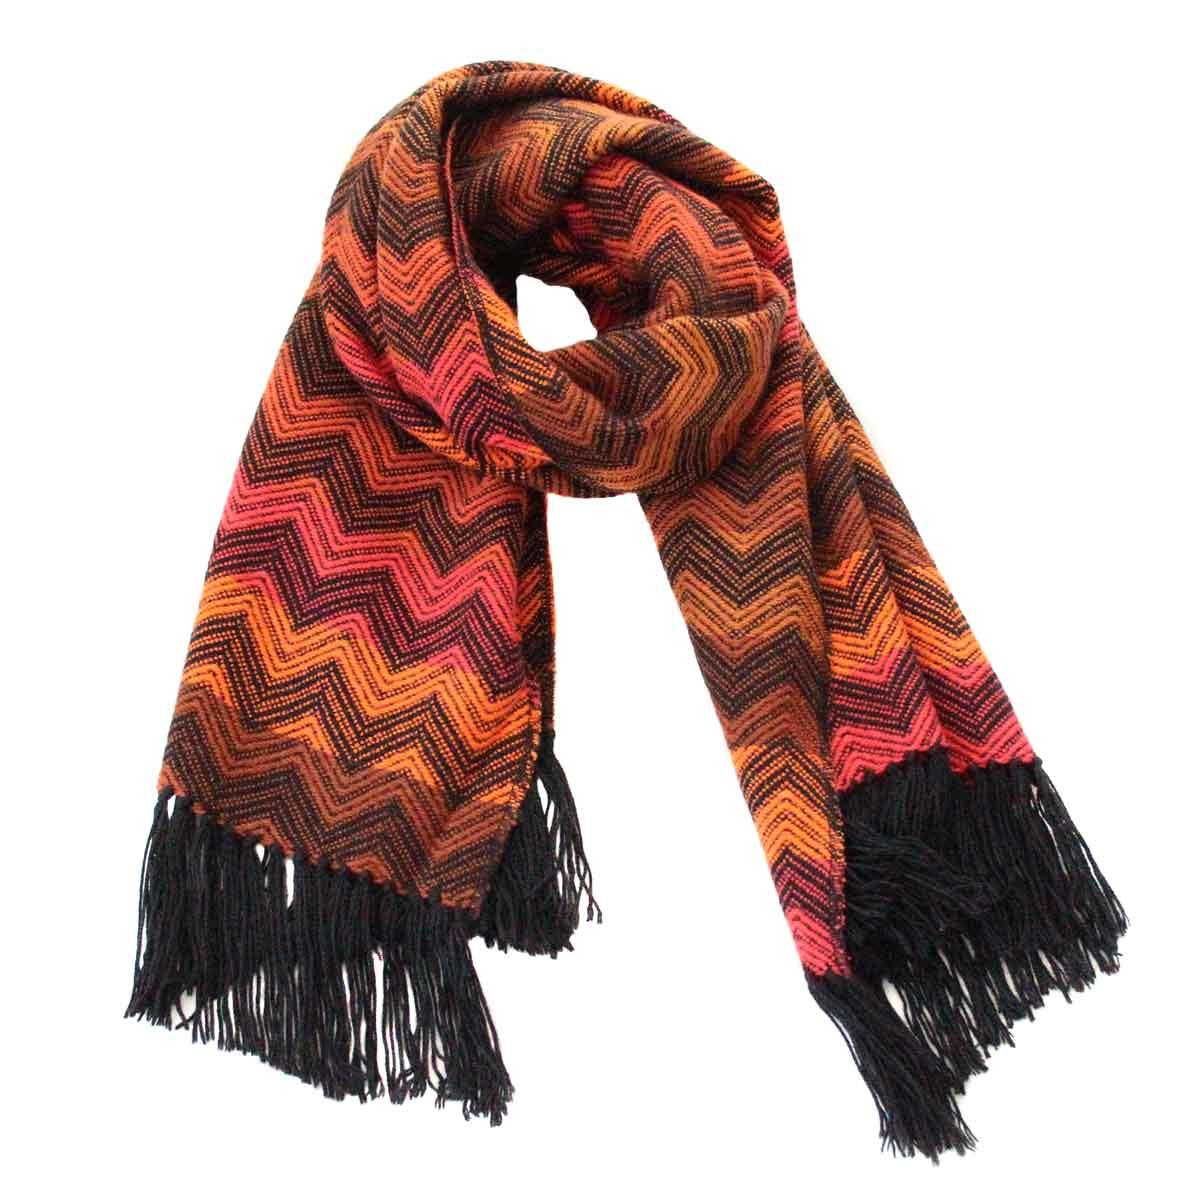 Inka-Products-Châle SAYTU-Orange motifs ethniques